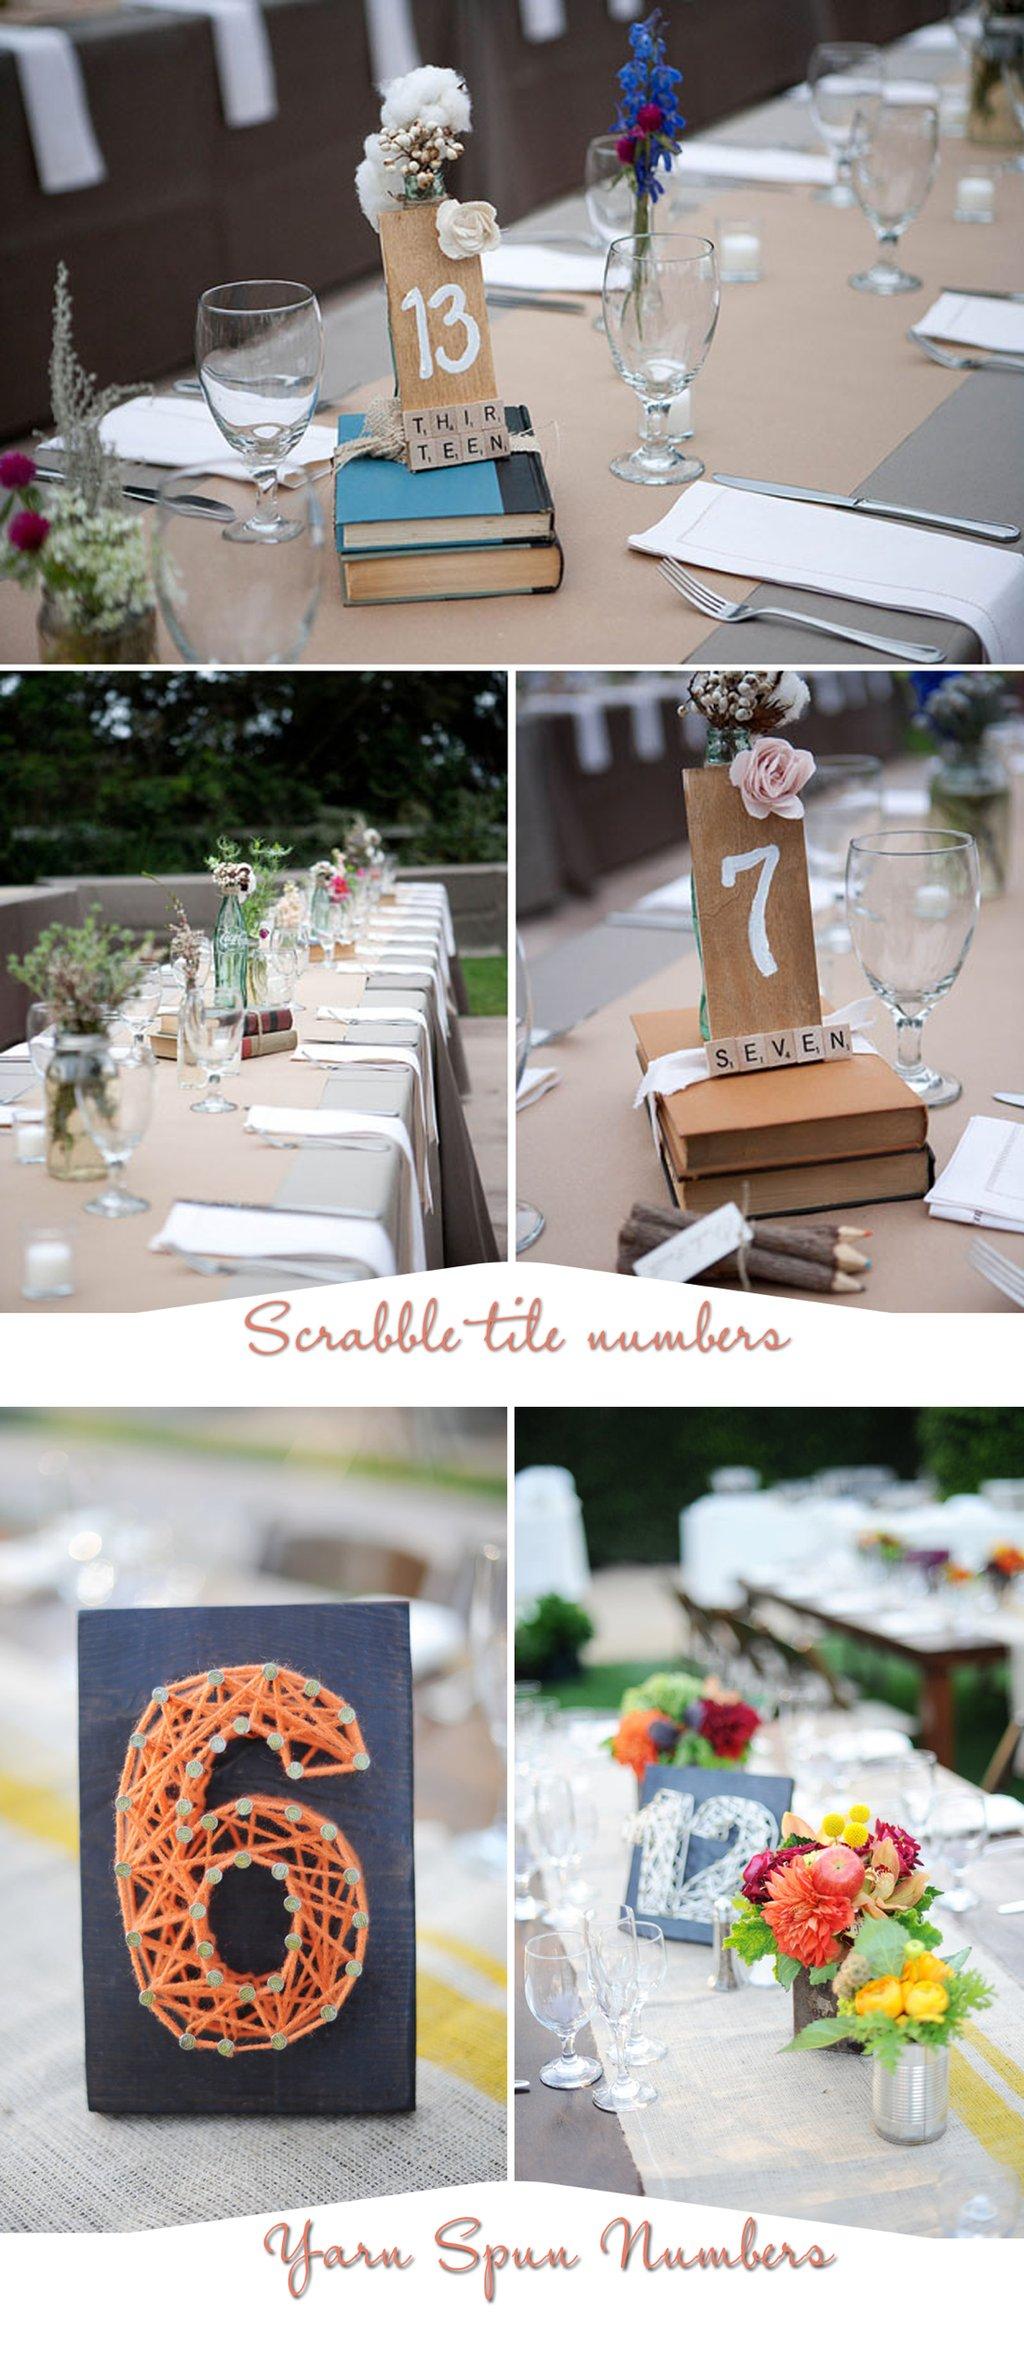 Diy-wedding-reception-ideas-table-numbers.full